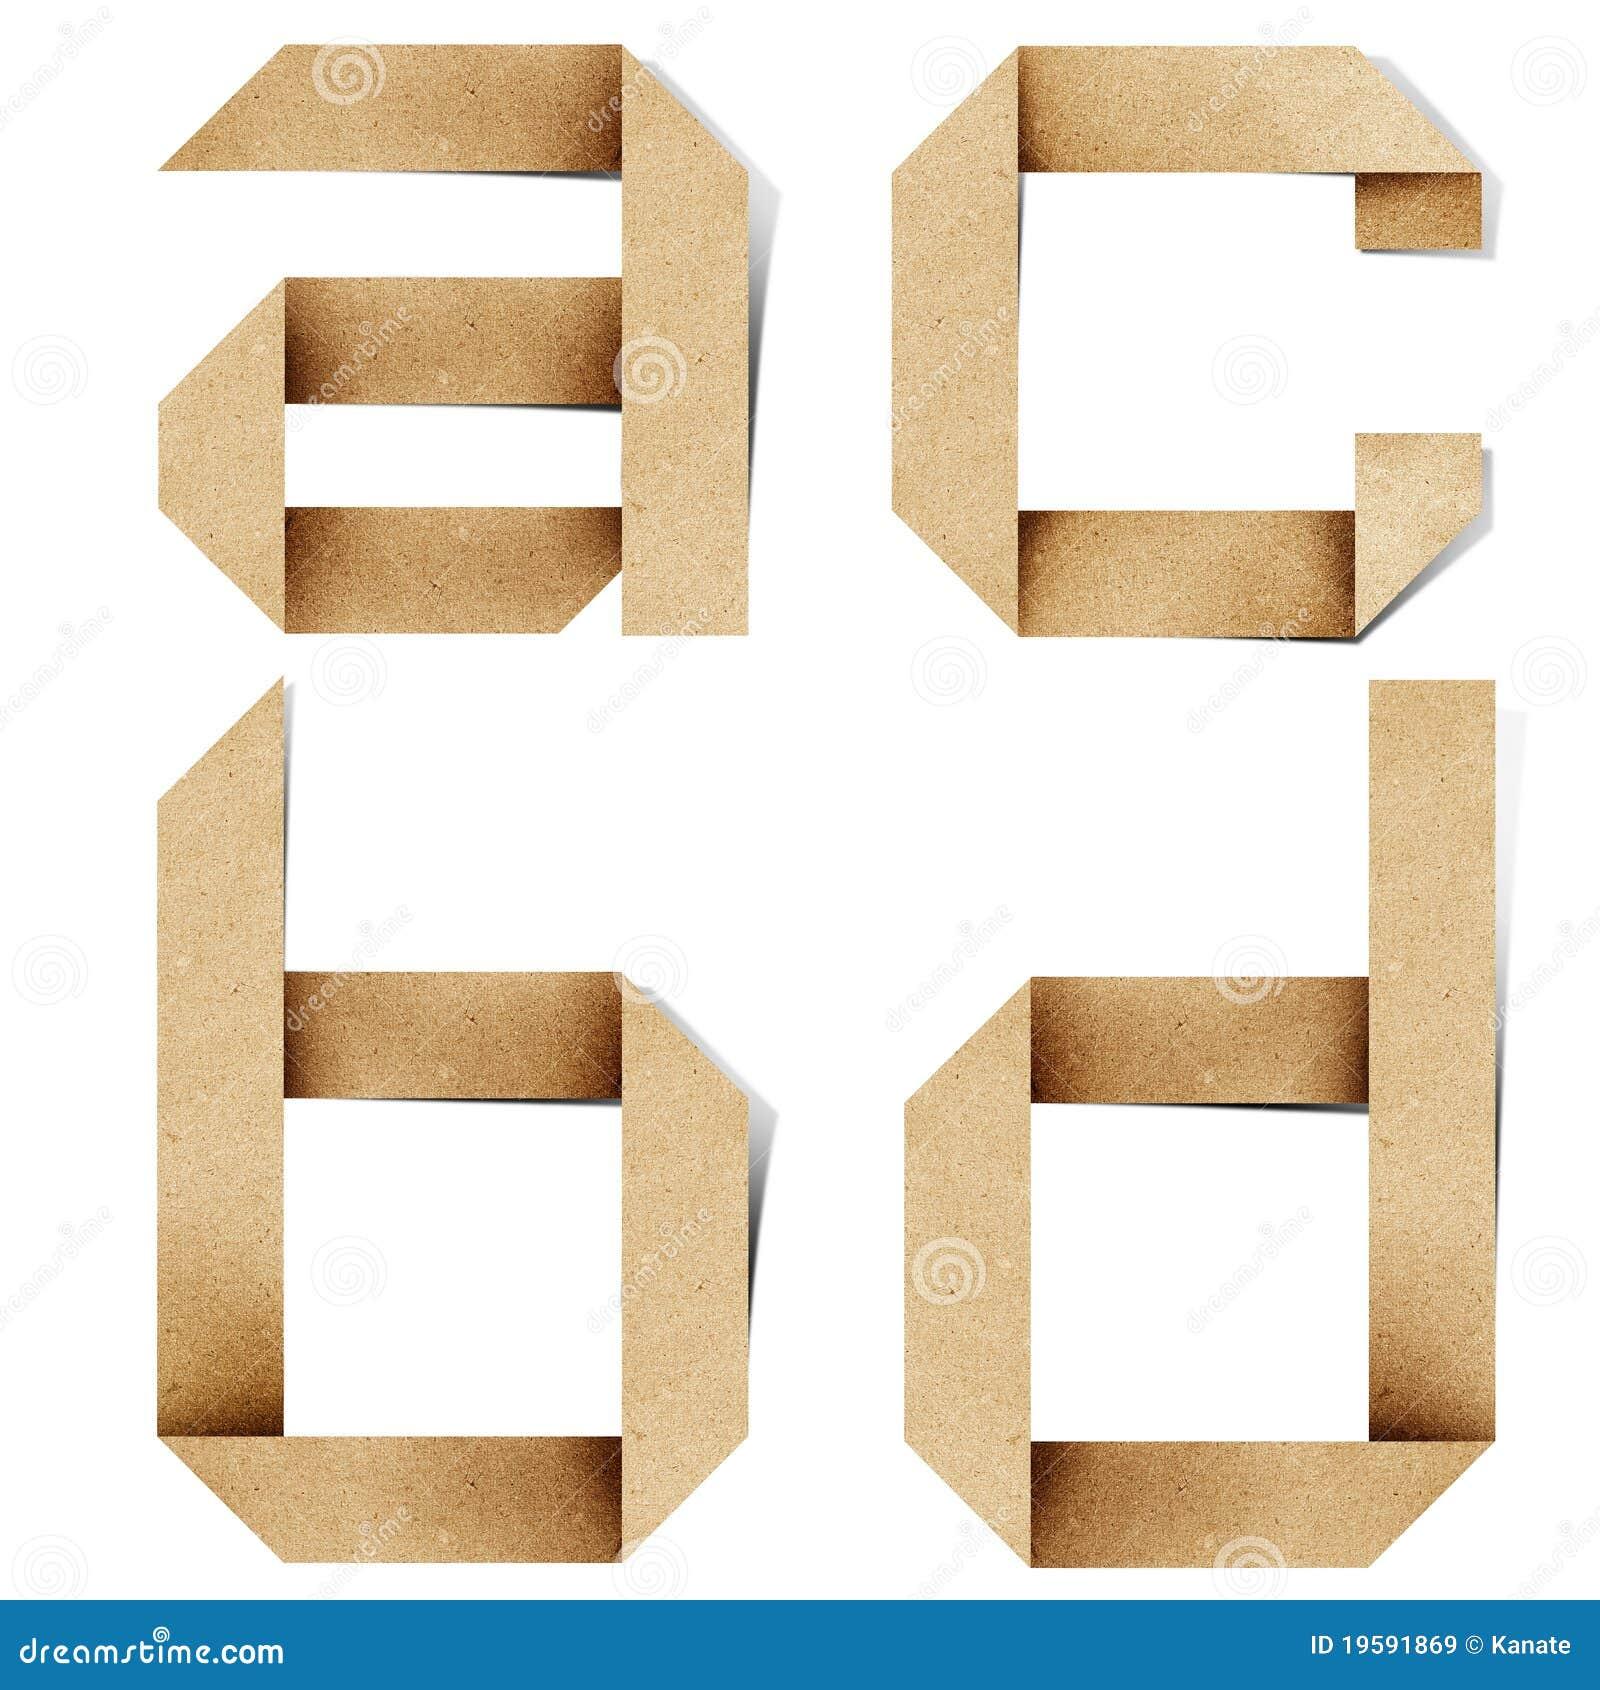 2014 april page 66 for Alphabet letters cardboard